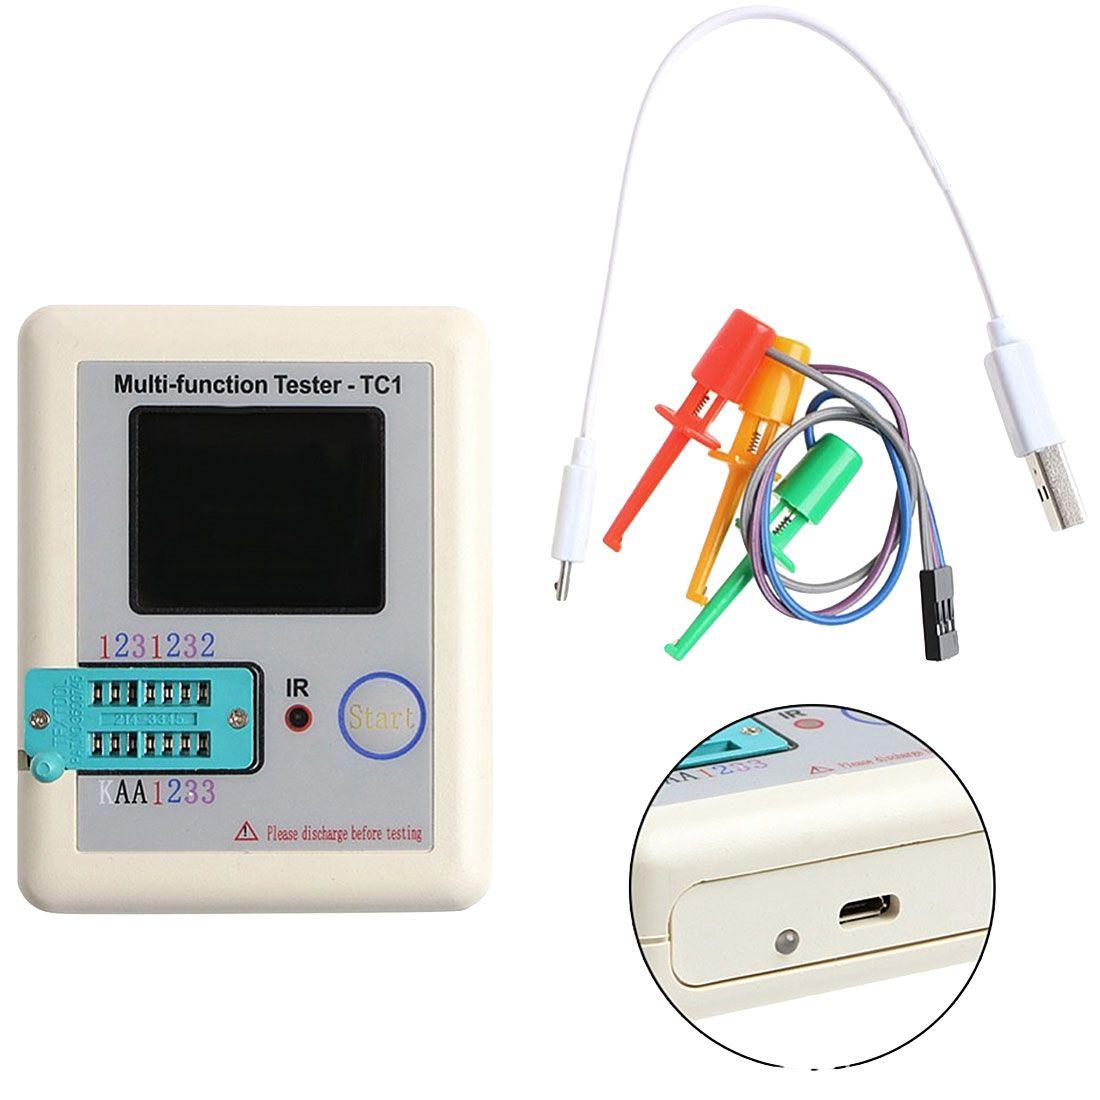 Transistor Tester TFT Diode Triode Capacitance Meter LCR ESR meter NPN PNP MOSFET IR Multifunction Tester Multimeter